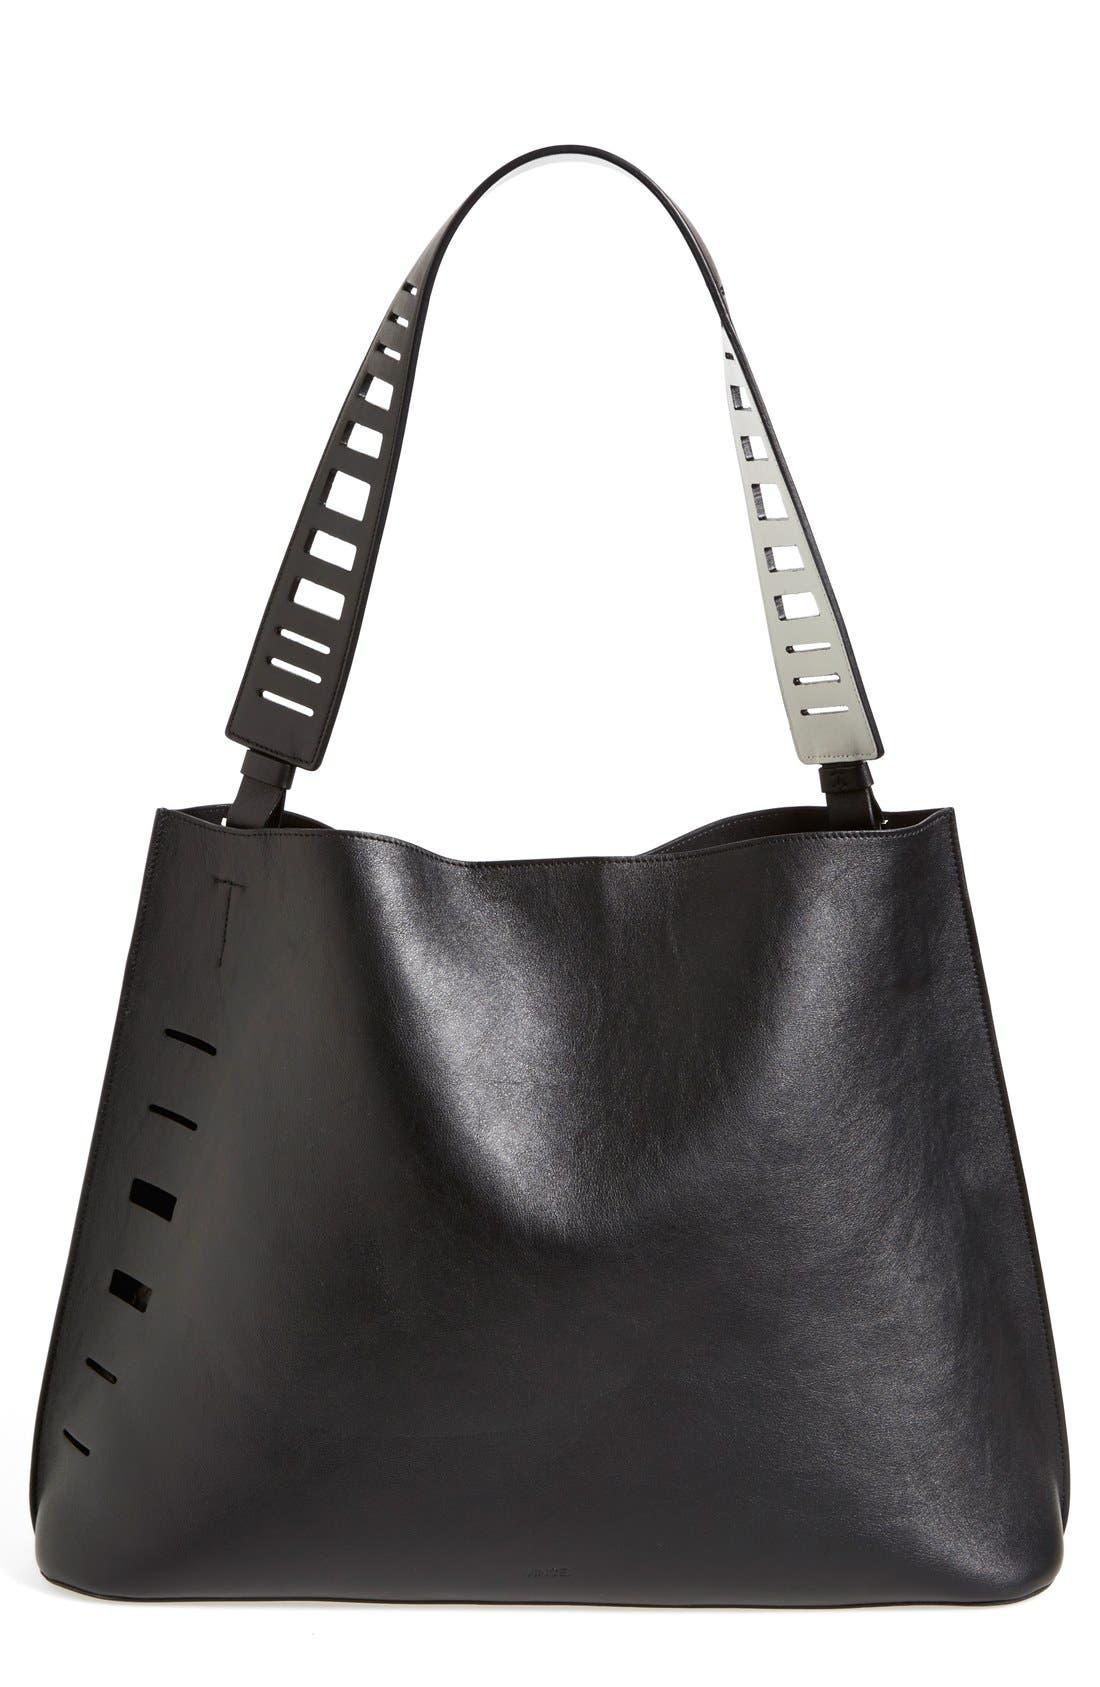 Main Image - Vince 'Medium' Cutout Leather Hobo